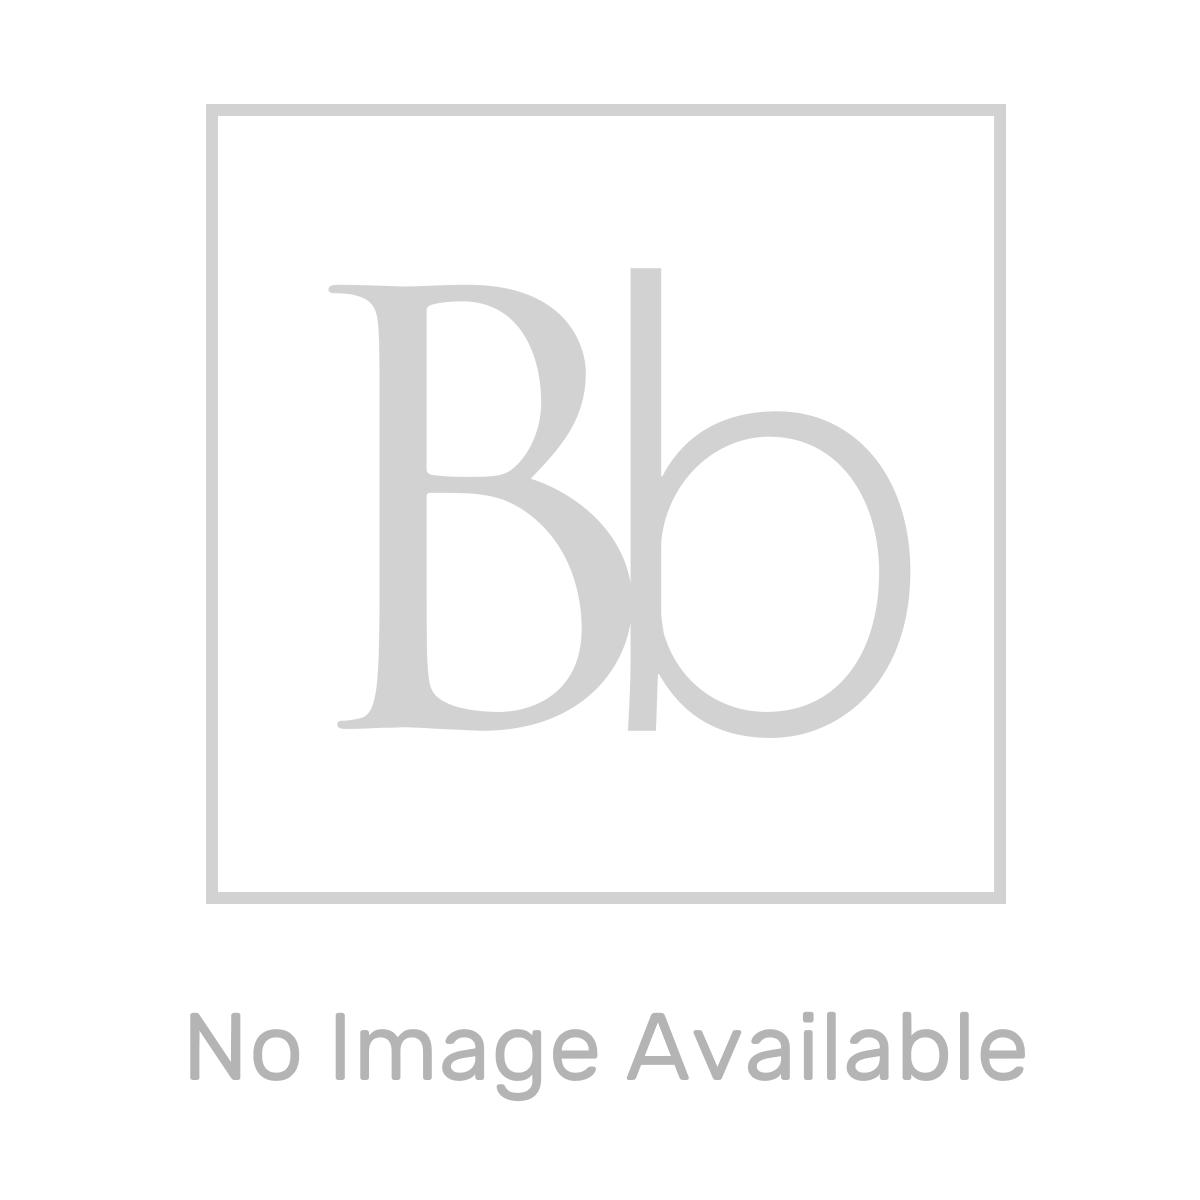 April Black Slate Shower Tray 1200 x 700 Line Drawing